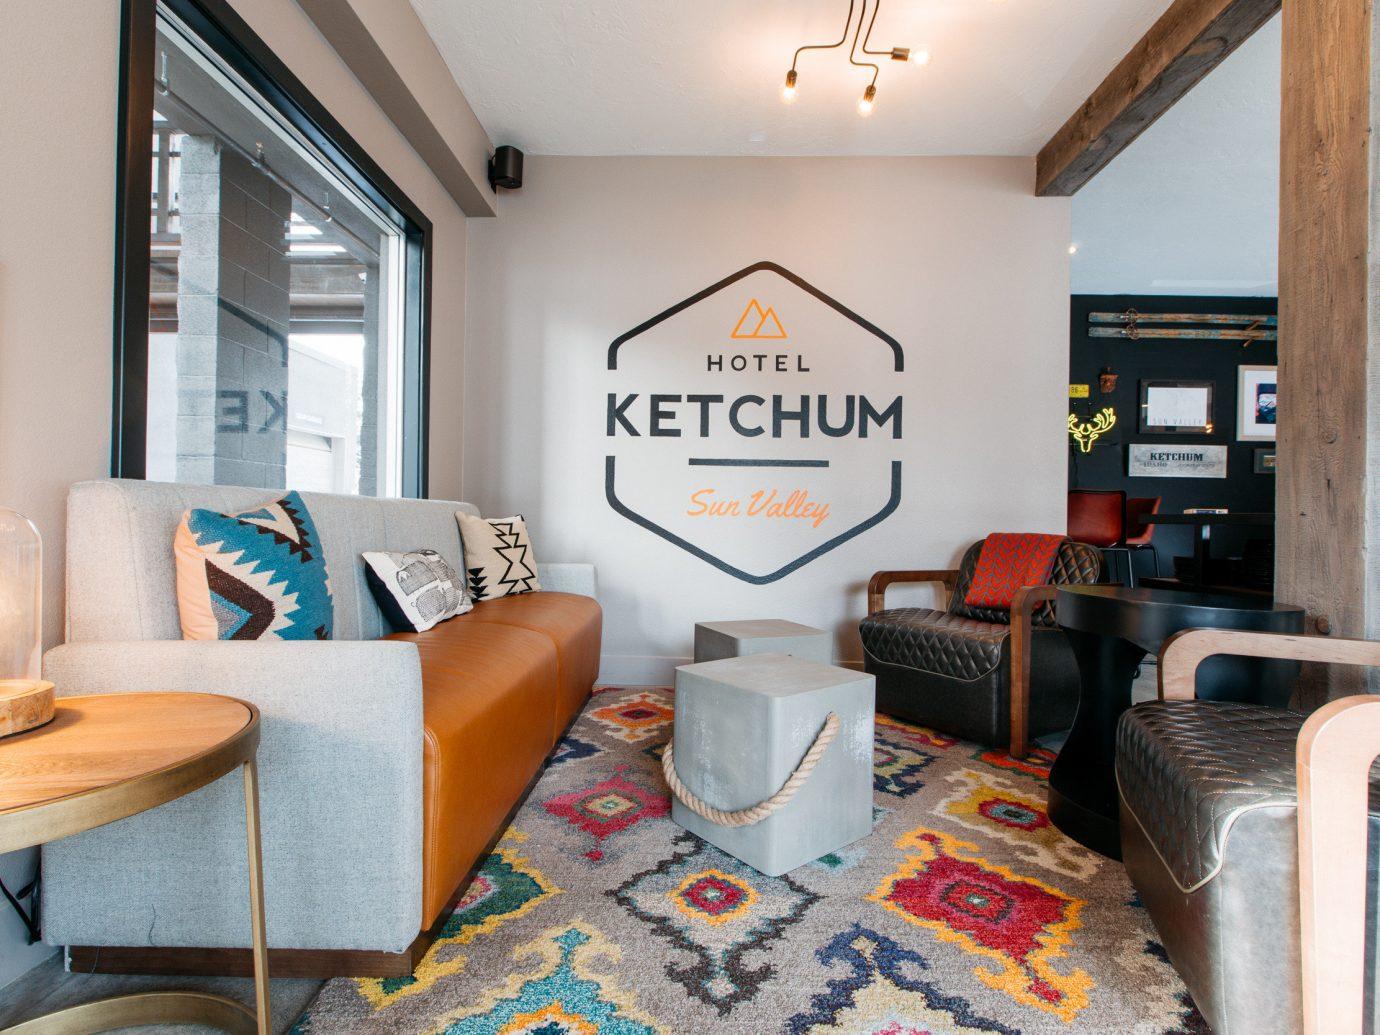 Trip Ideas room interior design living room home real estate table furniture apartment